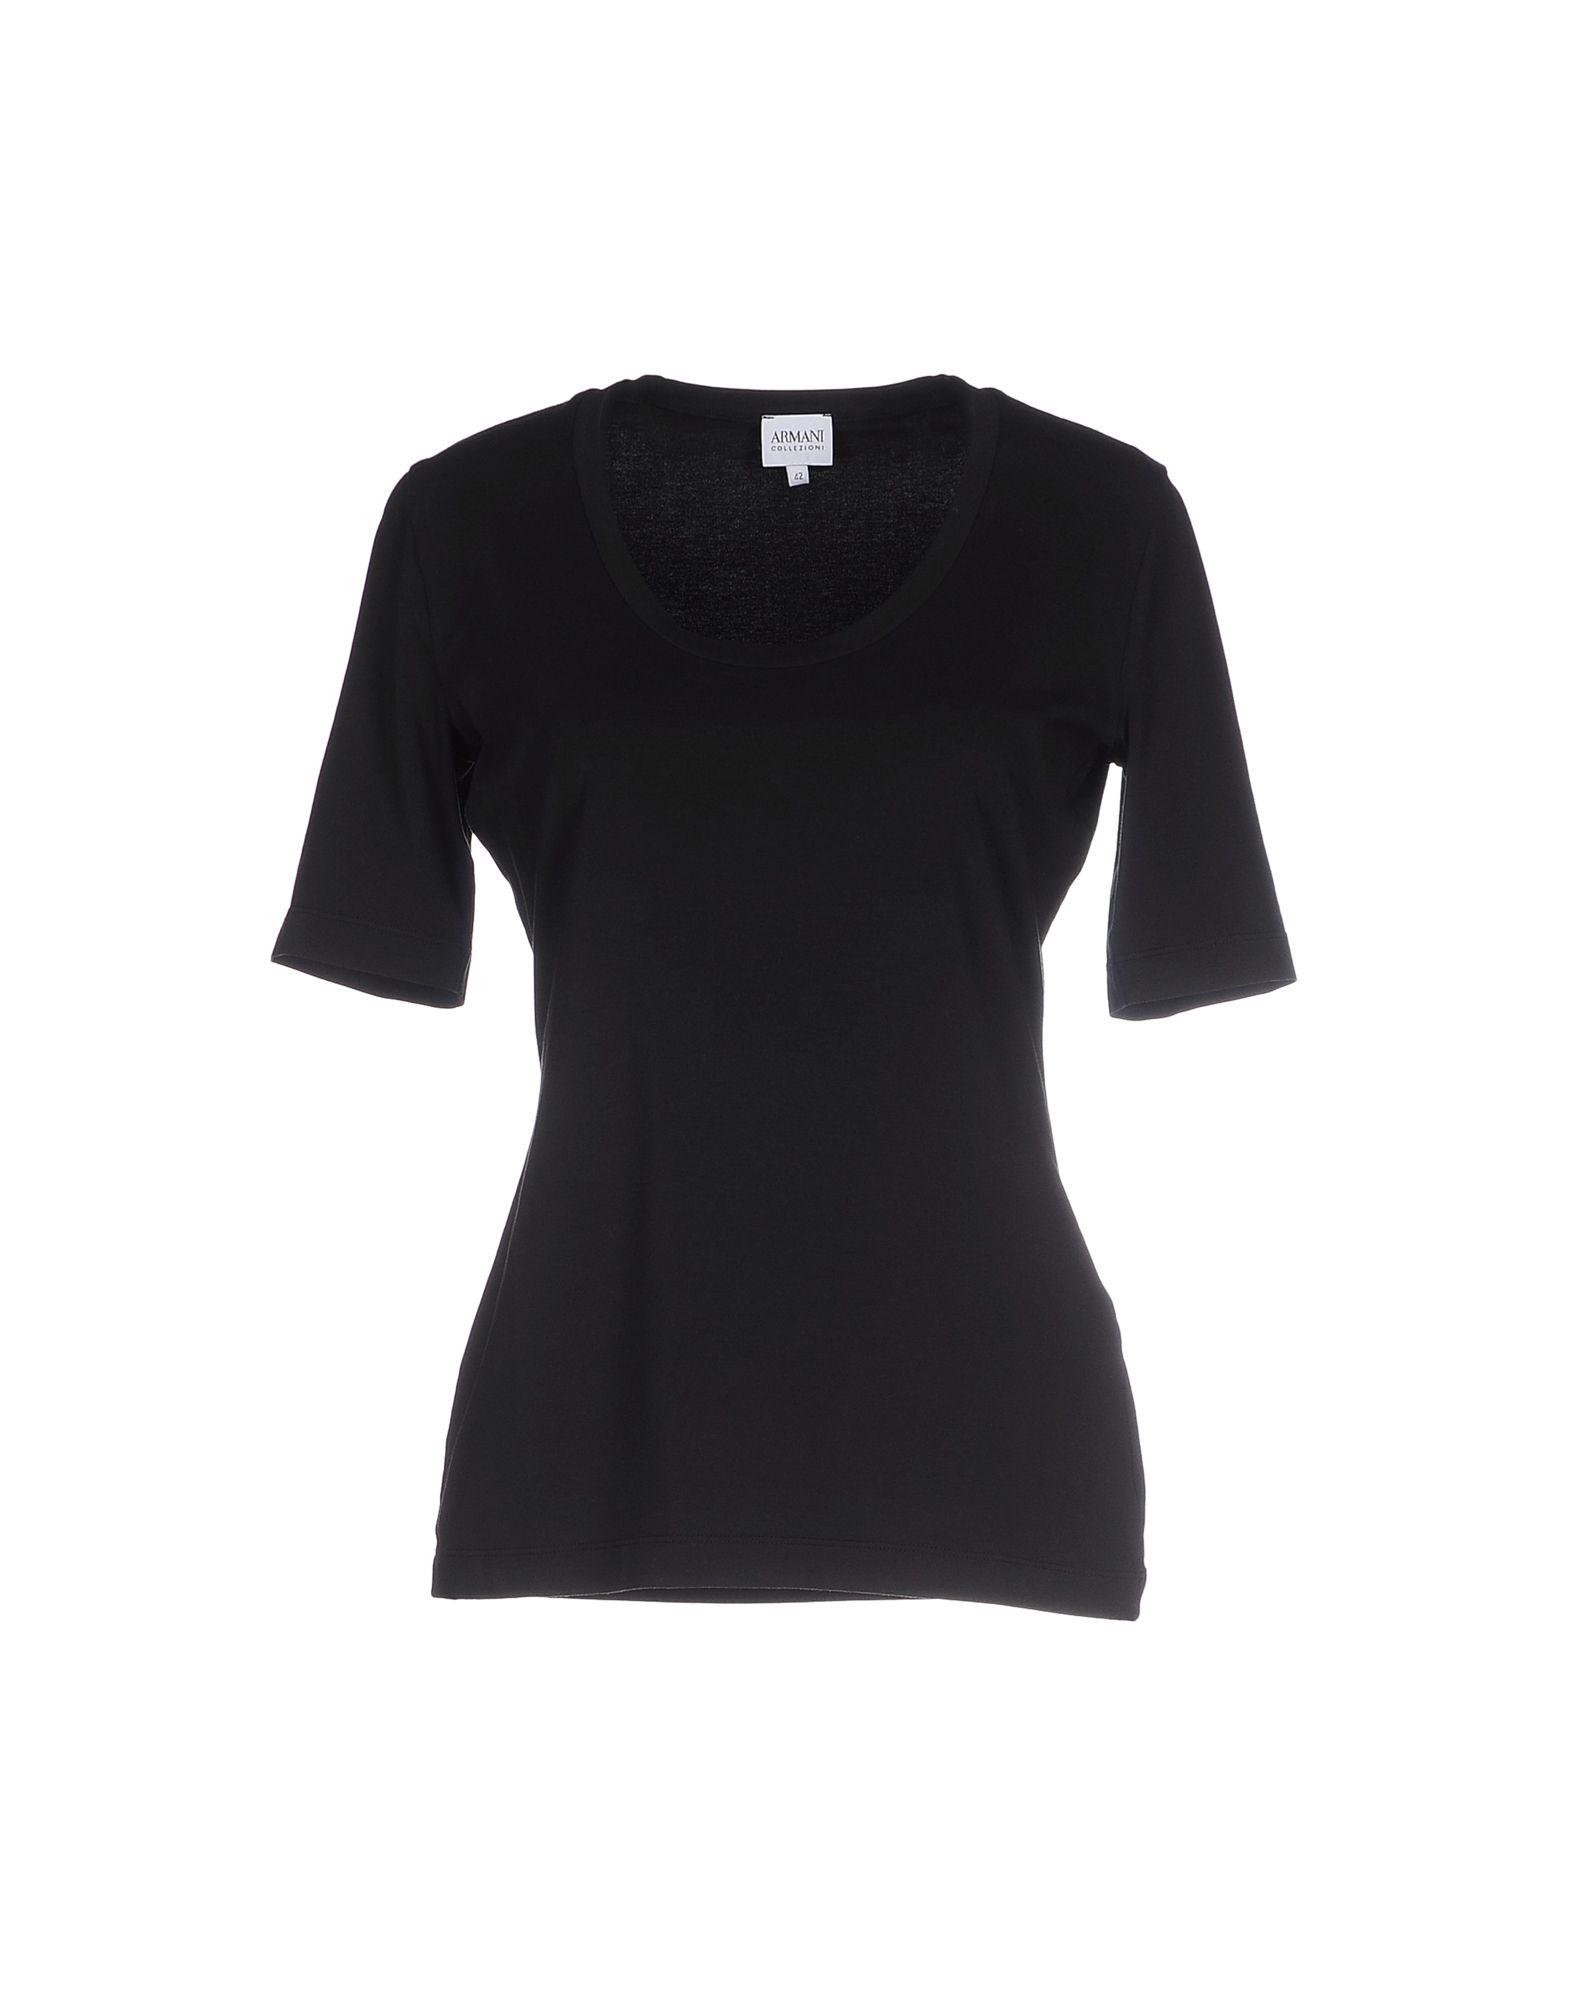 Armani t shirt in multicolor black lyst for Black armani t shirt